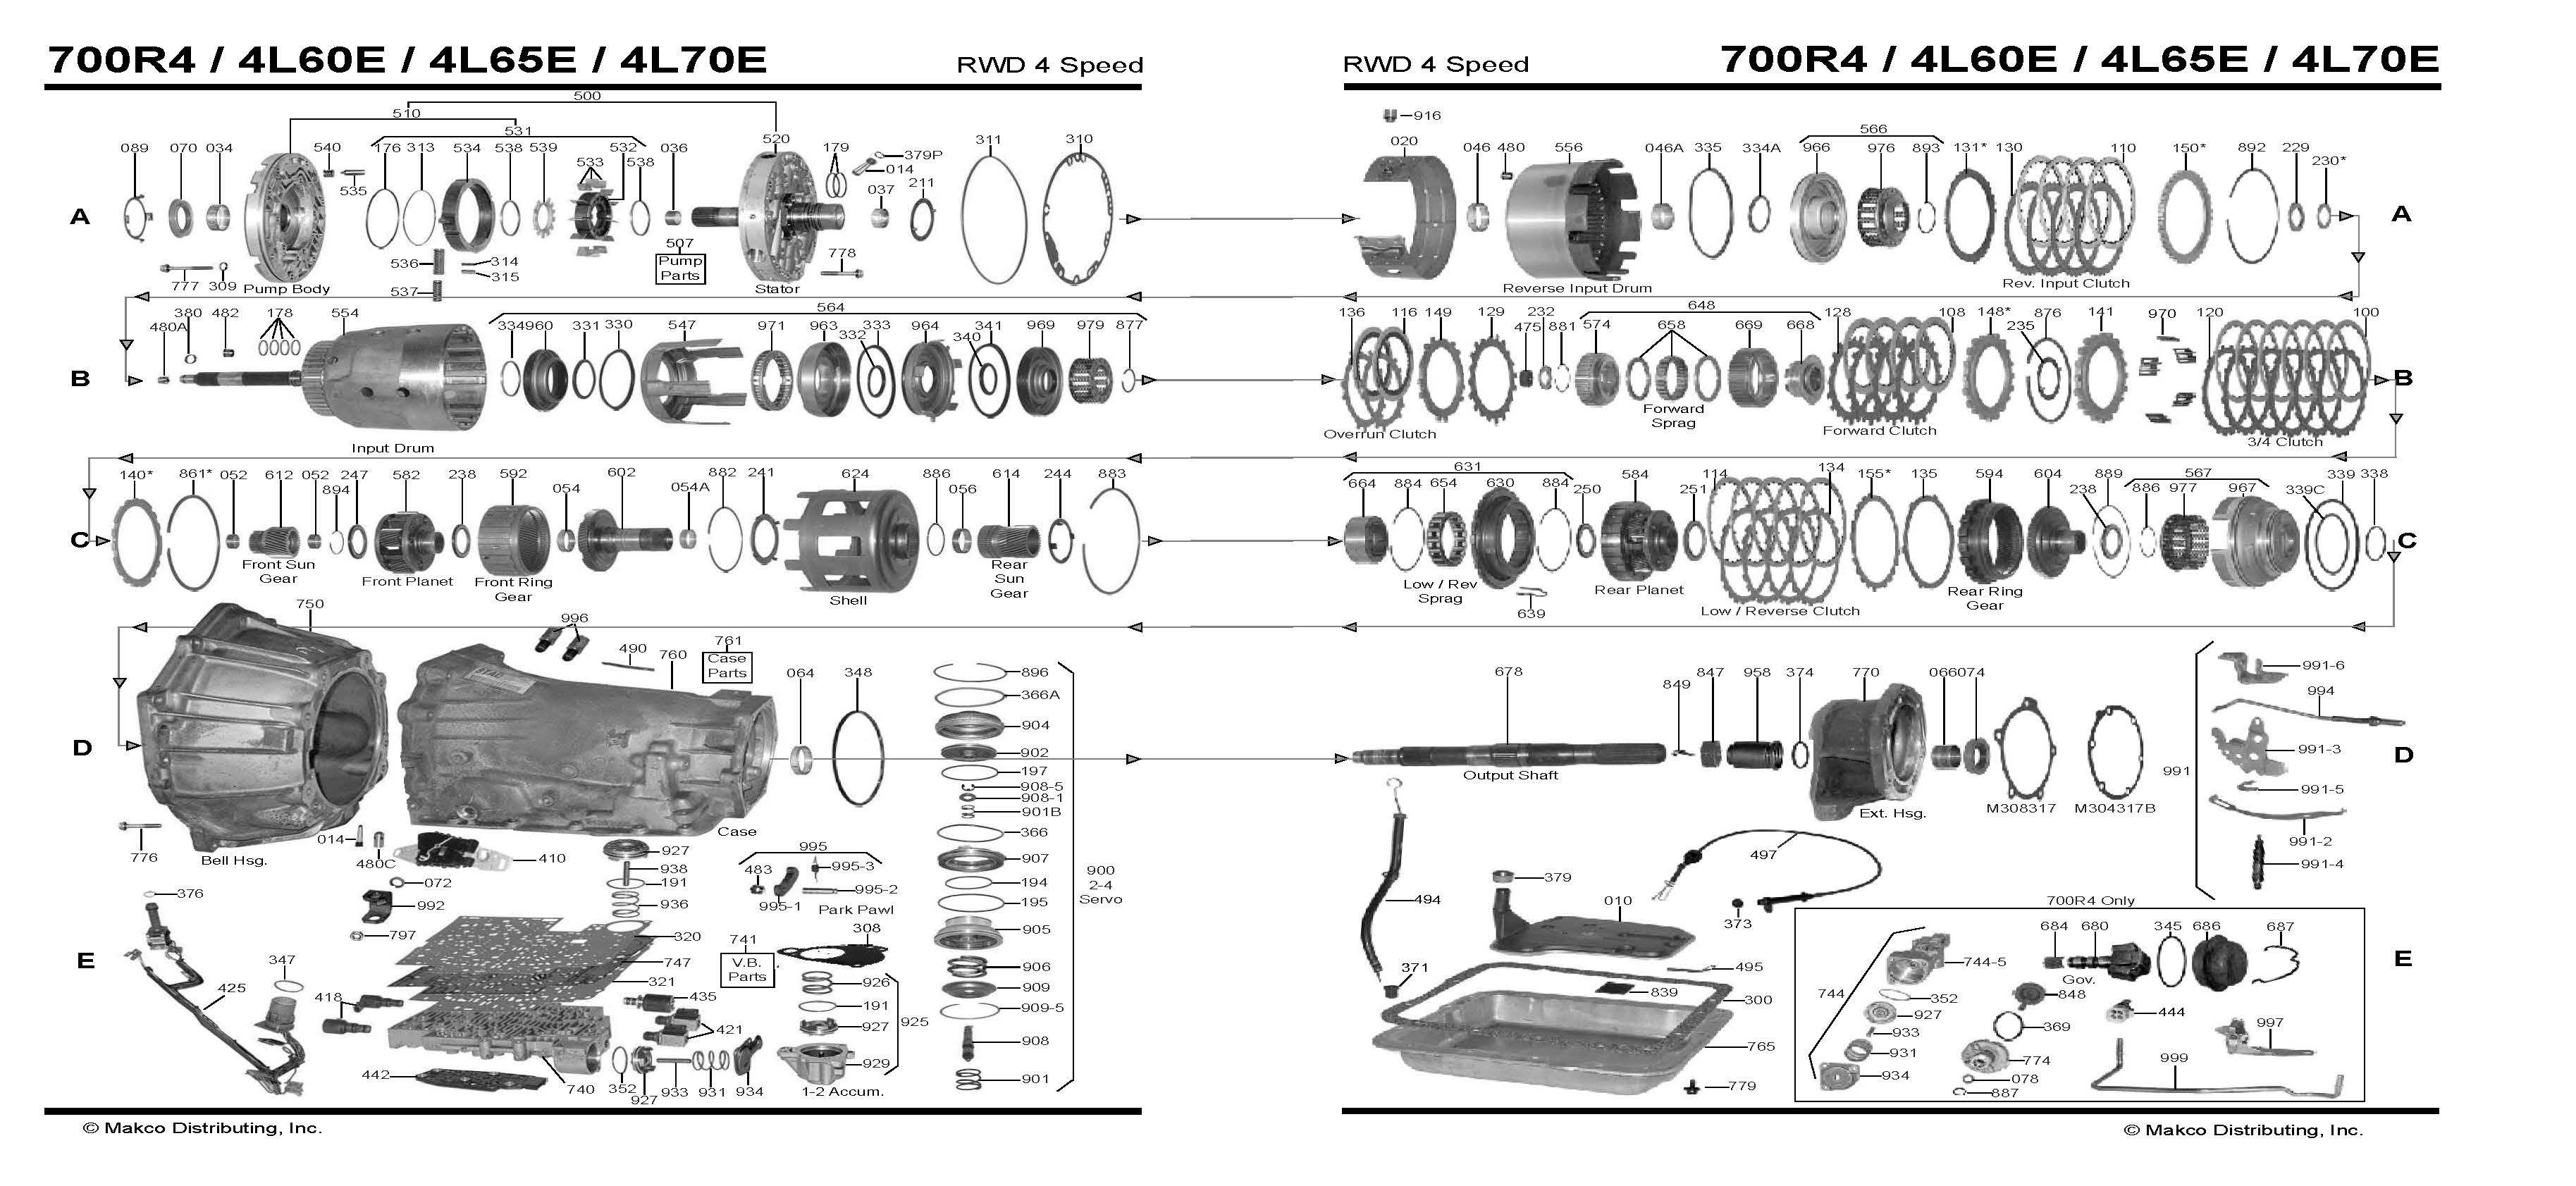 700r4 4x4 transmission diagram kenwood kdc 1028 wiring 4l60e auto trans chart